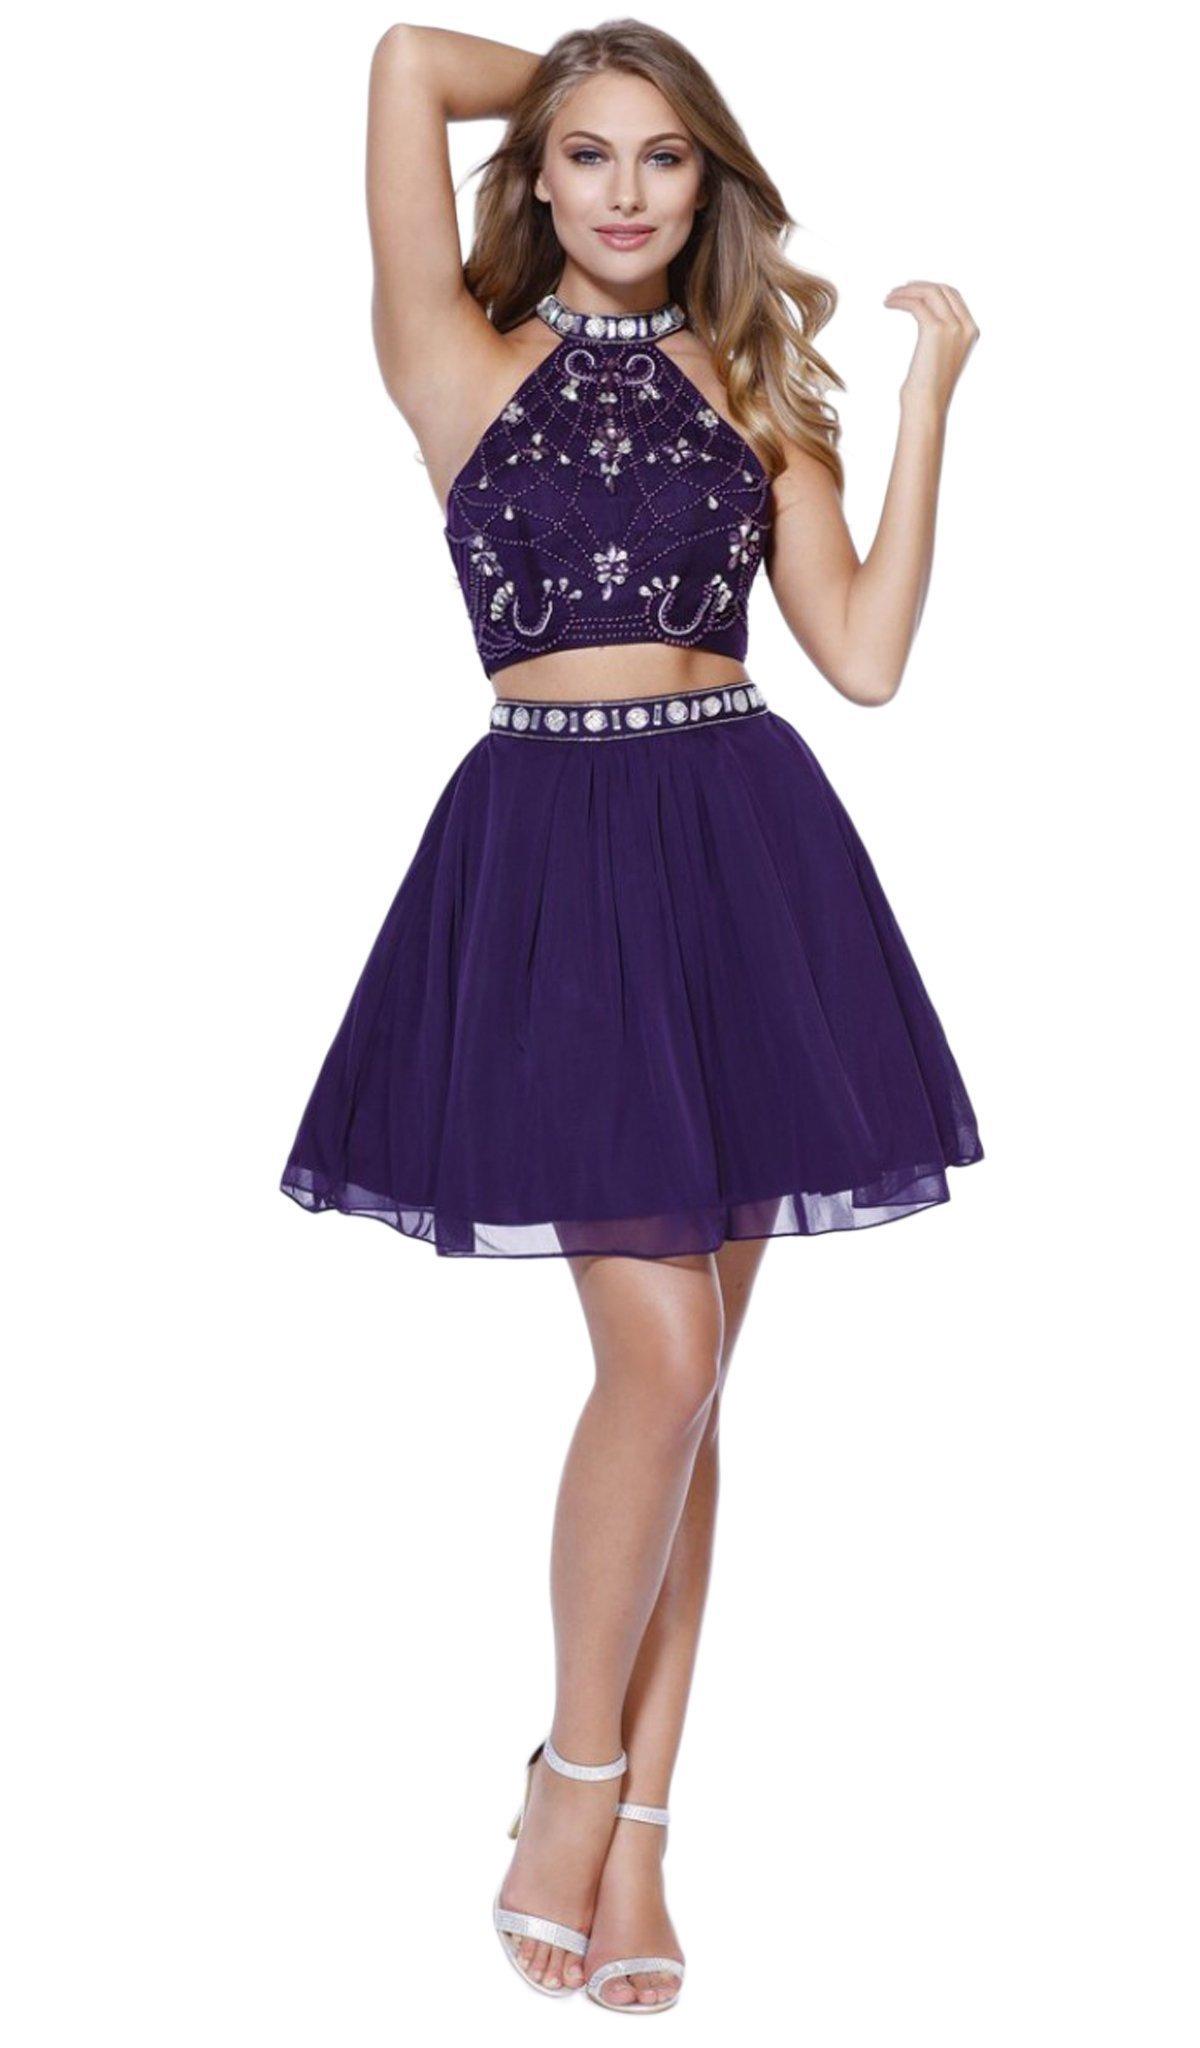 Nox Anabel - 6165 Two Piece Halter Dress